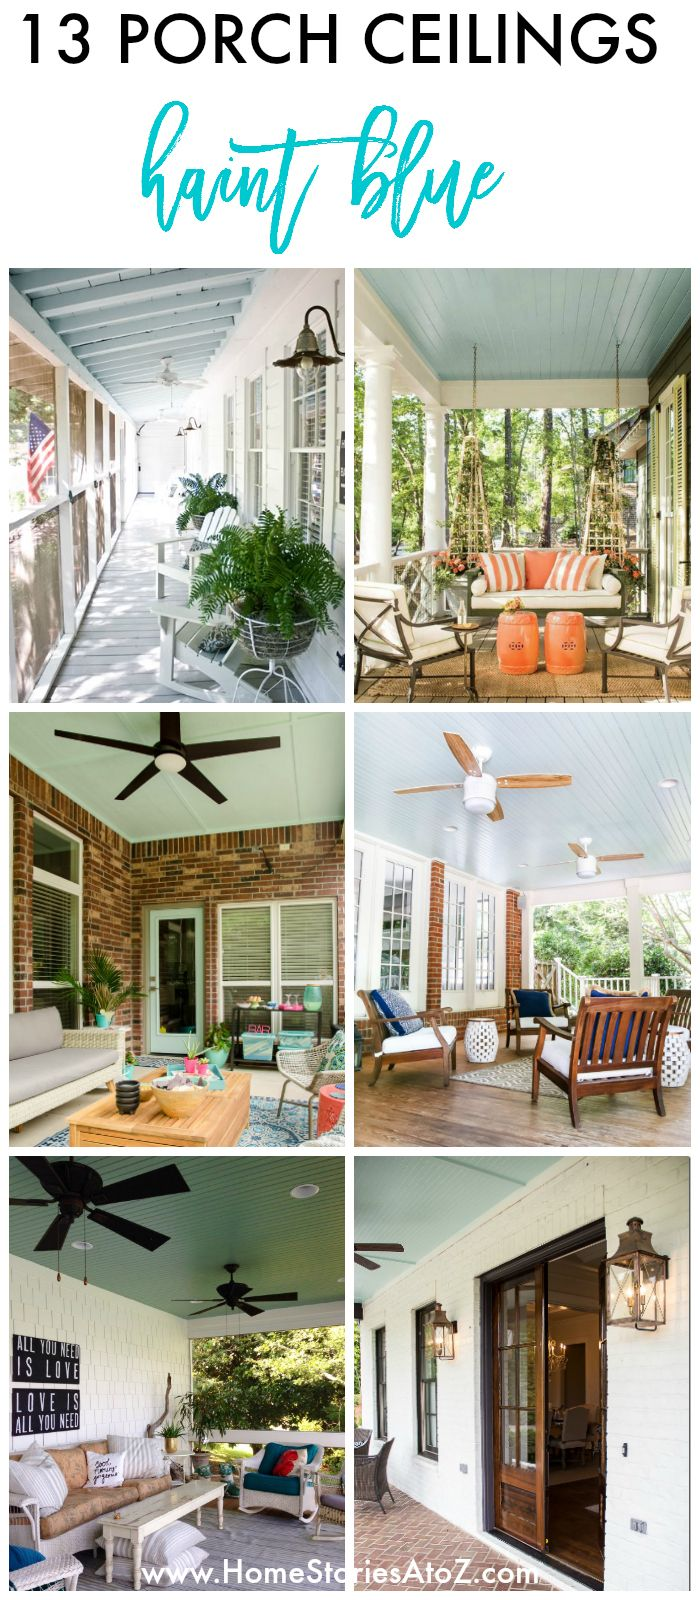 Best 25+ Haint blue porch ceiling ideas on Pinterest ...